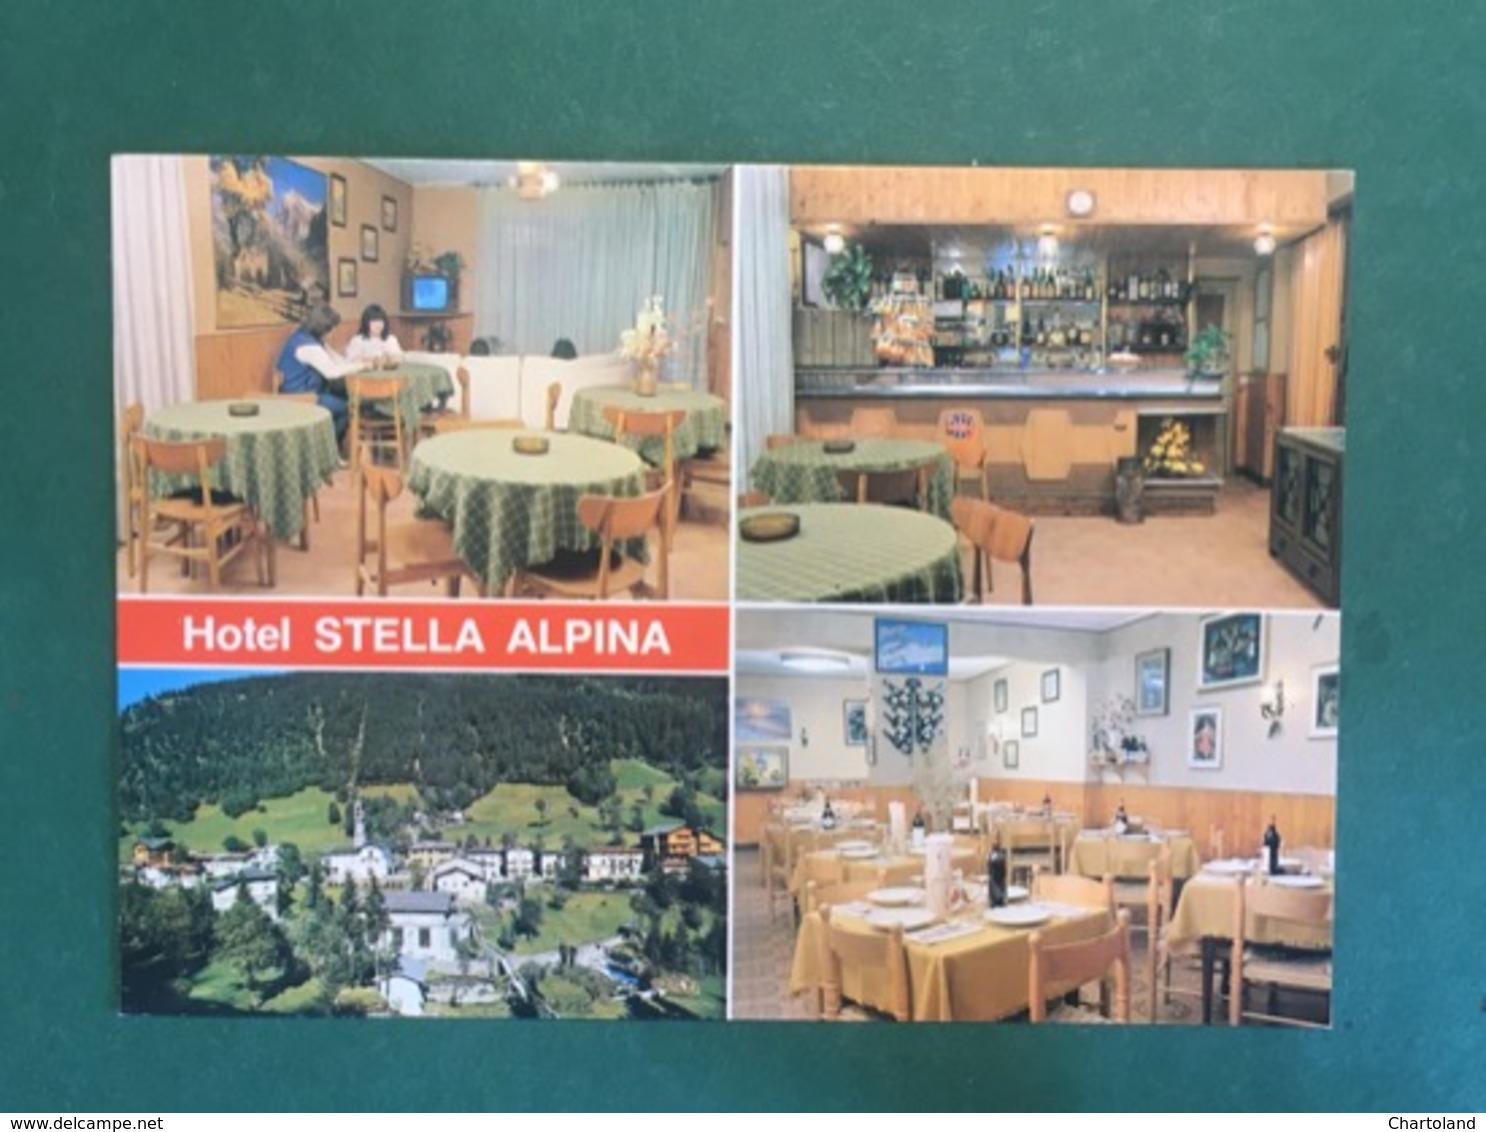 Cartolina Hotel Stella Alpina - Valcanale - Bergamo - 1970 Ca - Bergamo